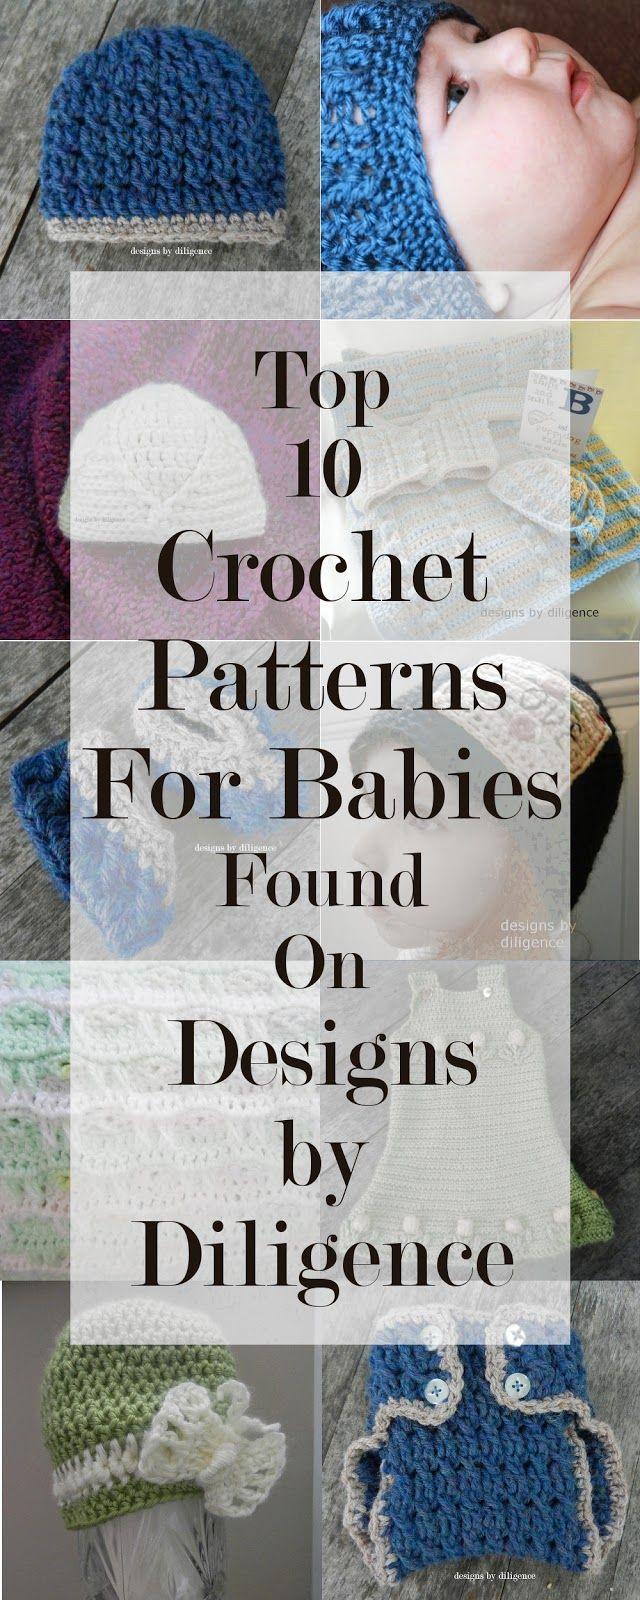 Pin de Kim Slone en Crafts - Crochet | Pinterest | Tejidos bebe ...